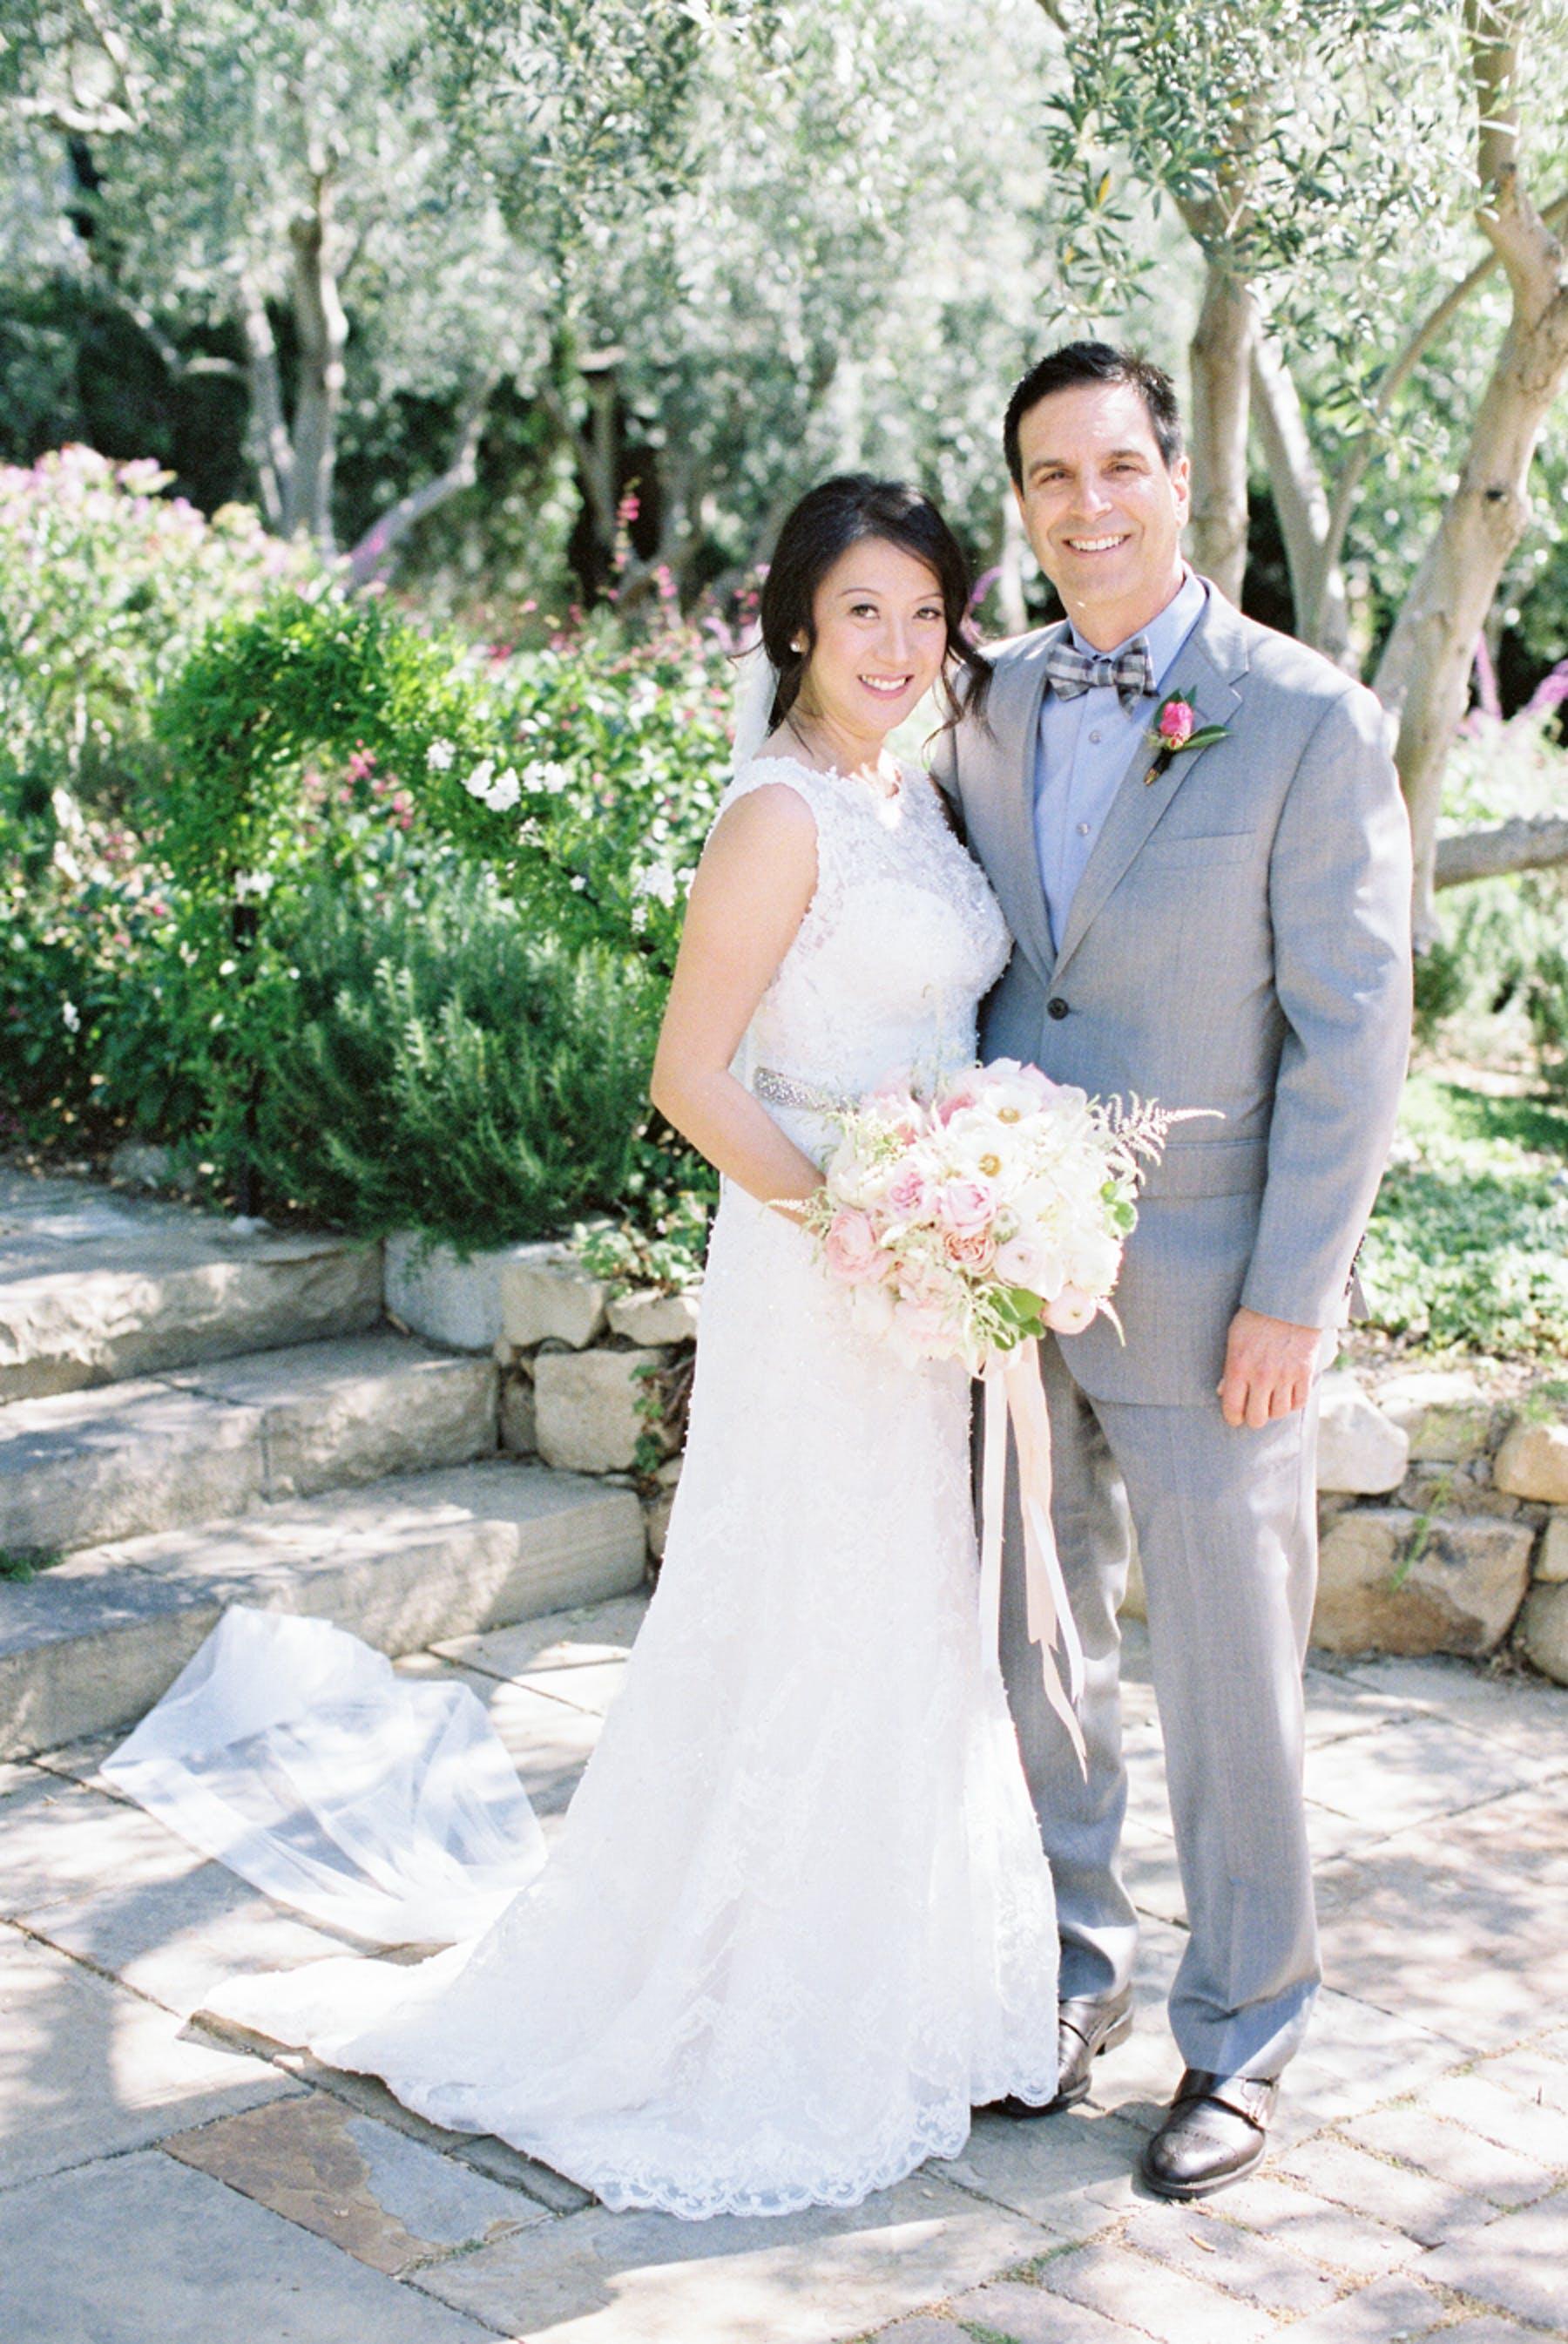 www.santabarbarawedding.com | Michael + Anna Costa Photography | San Ysidro Ranch | Twine Events | Coco Rose Design | Bride and Groom Pose